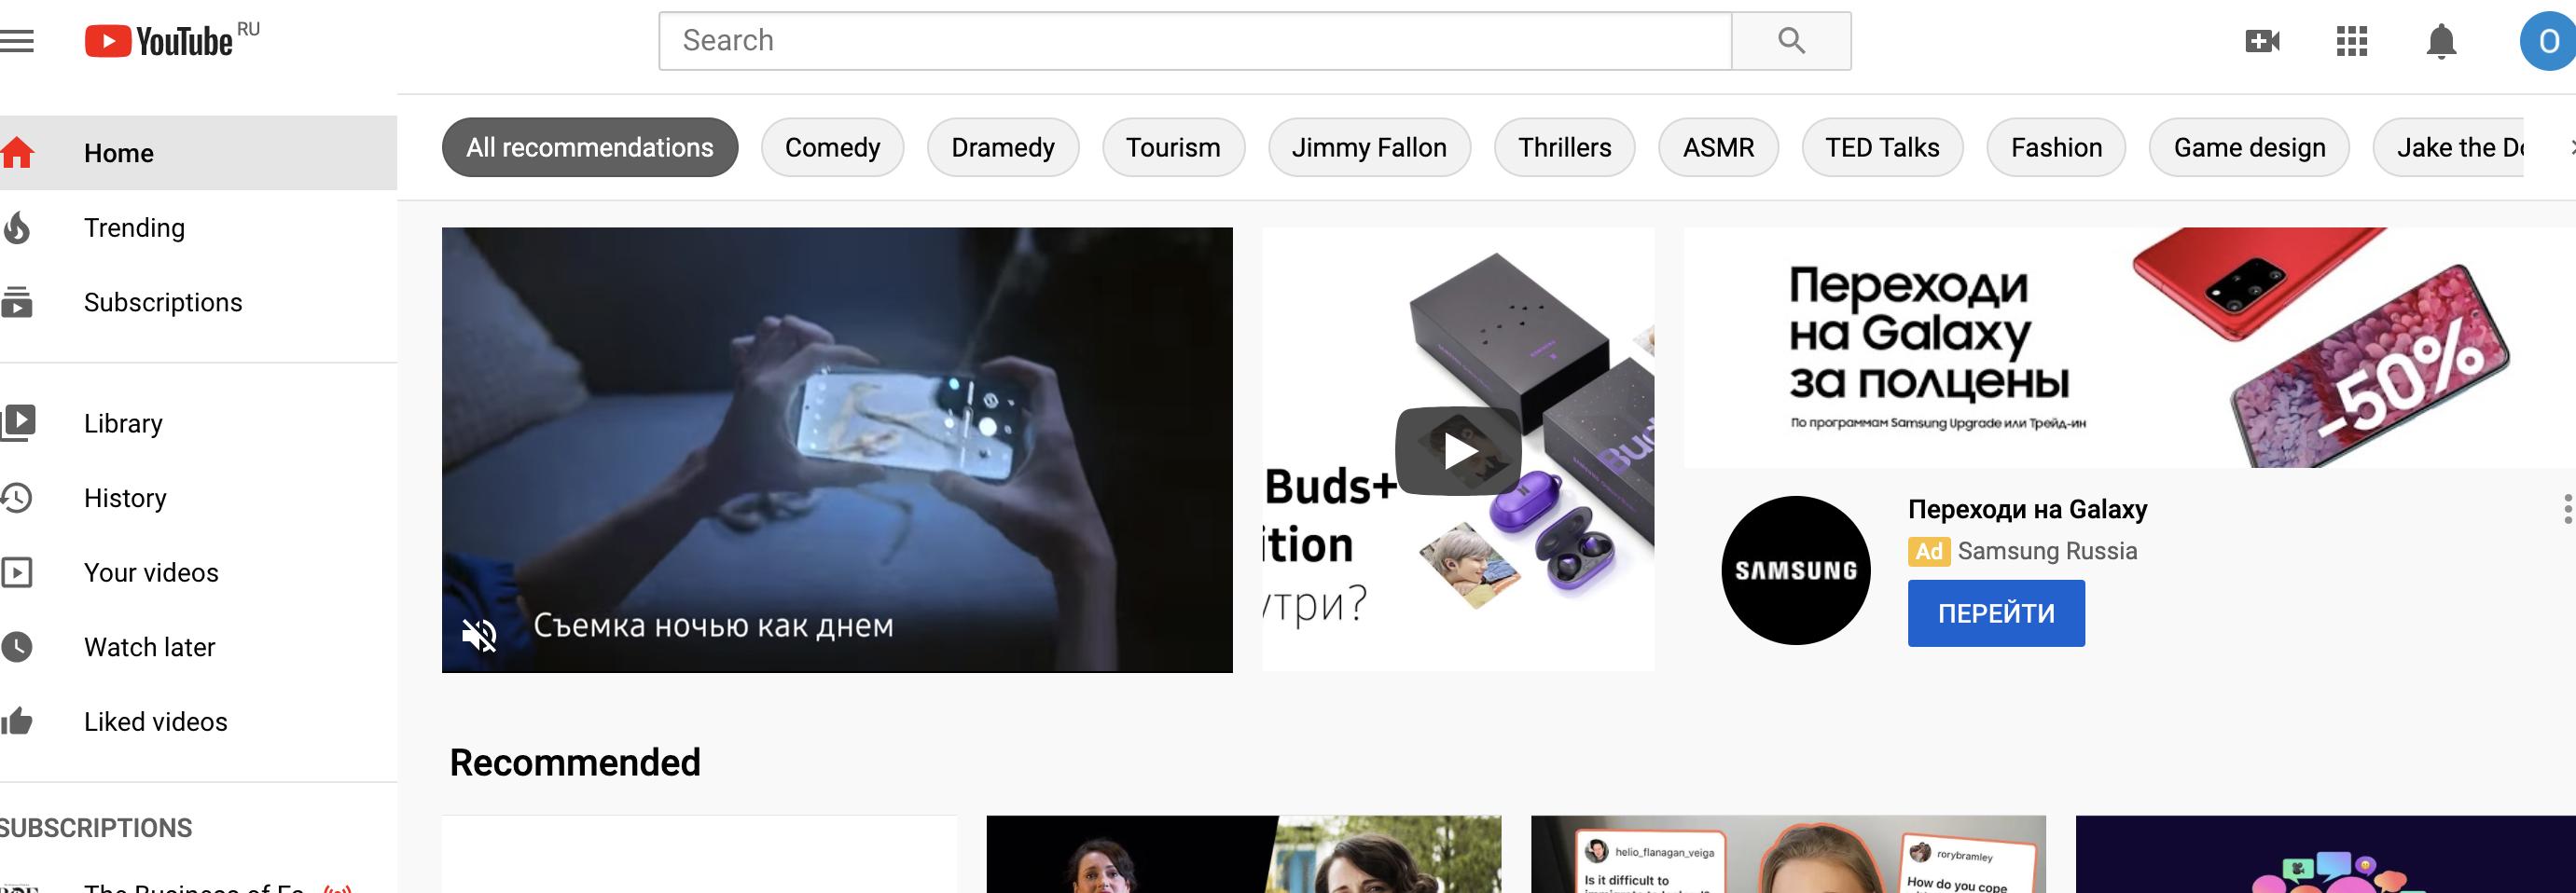 Пример рекламы в формате Masthead на YouTube